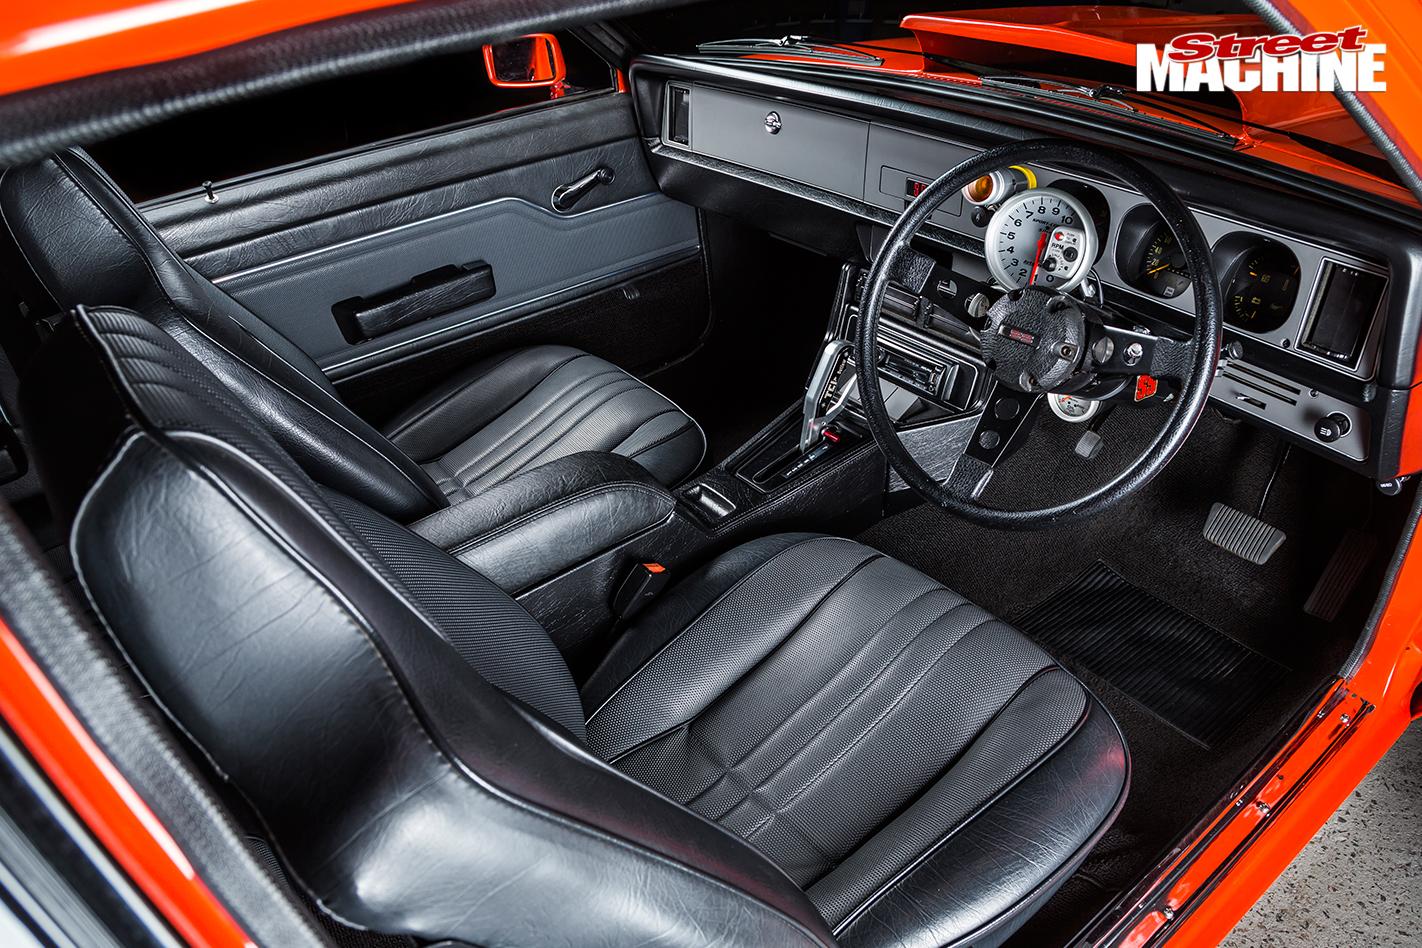 1976-SIX-CYLINDER-HOLDEN-LX-TORANA-HATCH-interior